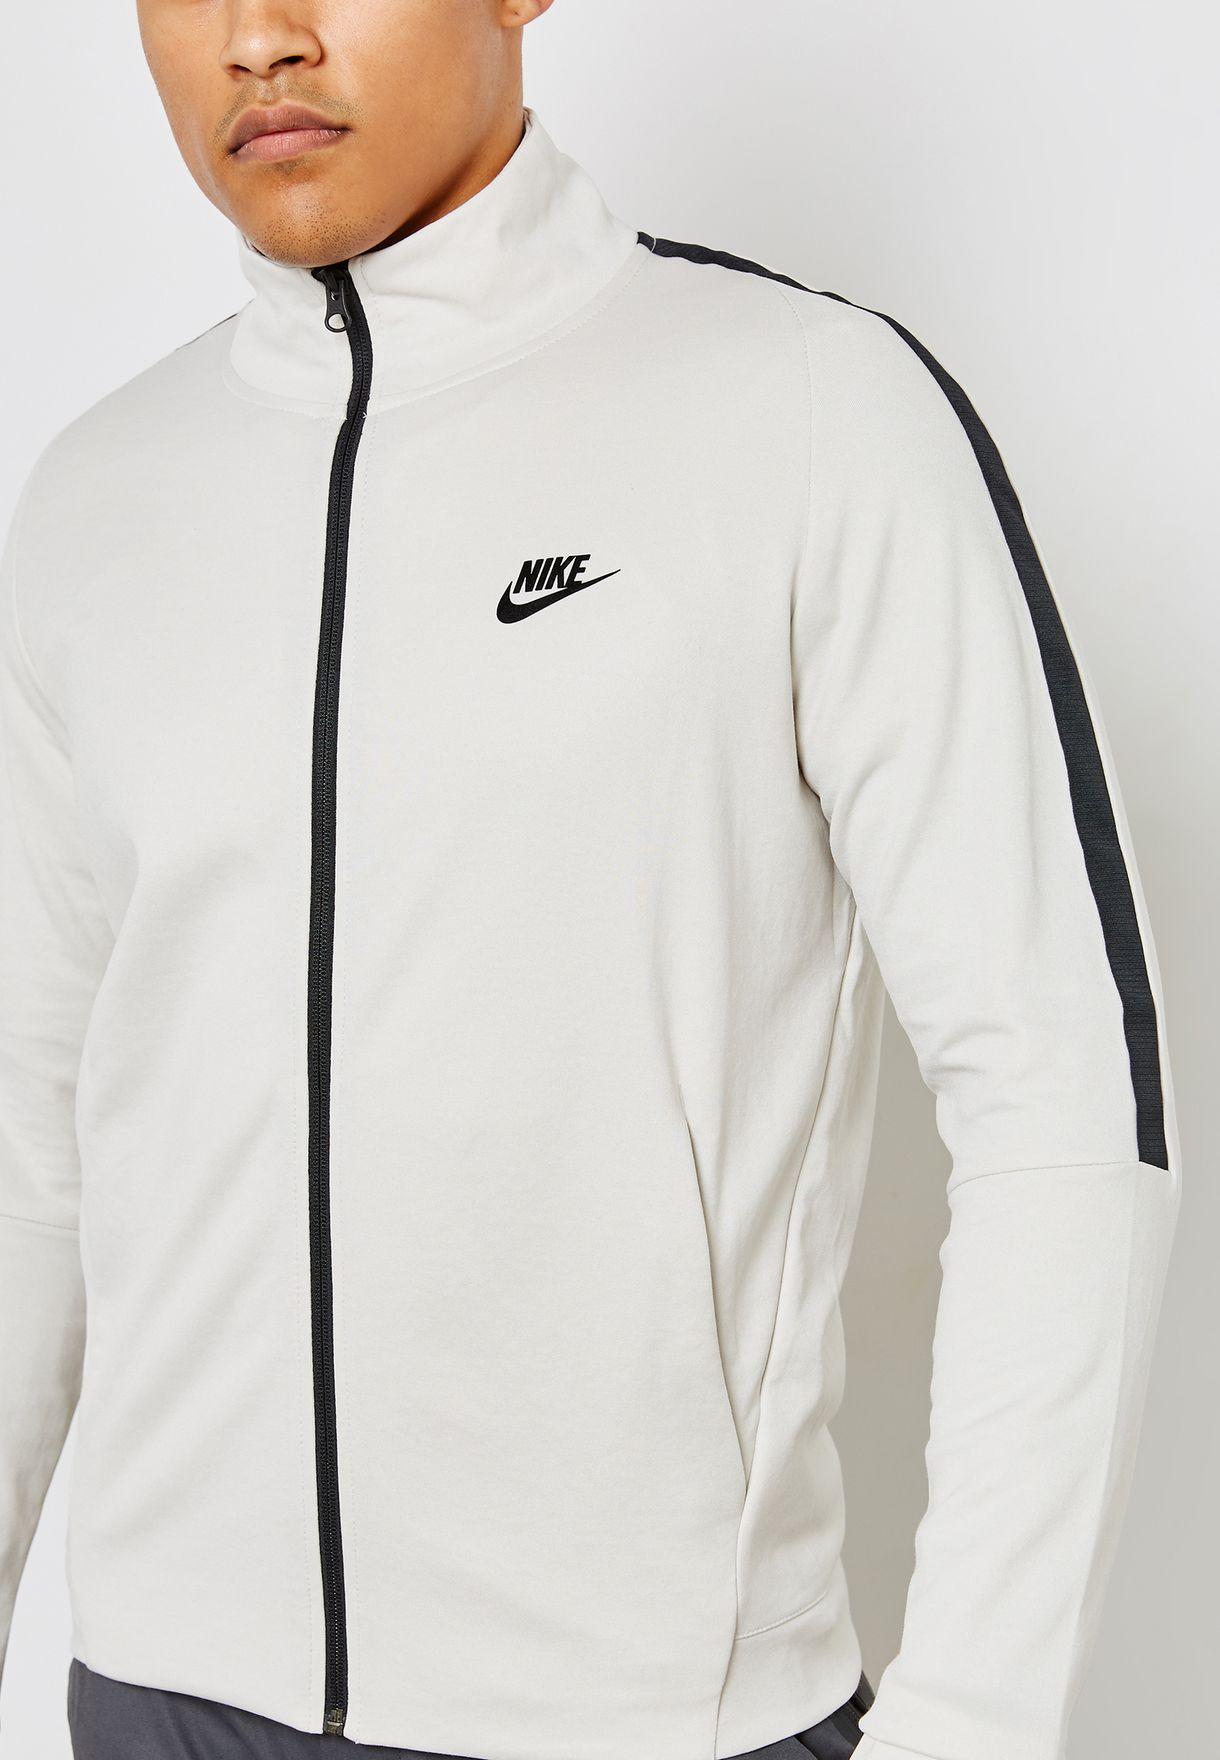 Buy Nike White N98 Tribute Jacket for Men in Mena, Worldwide